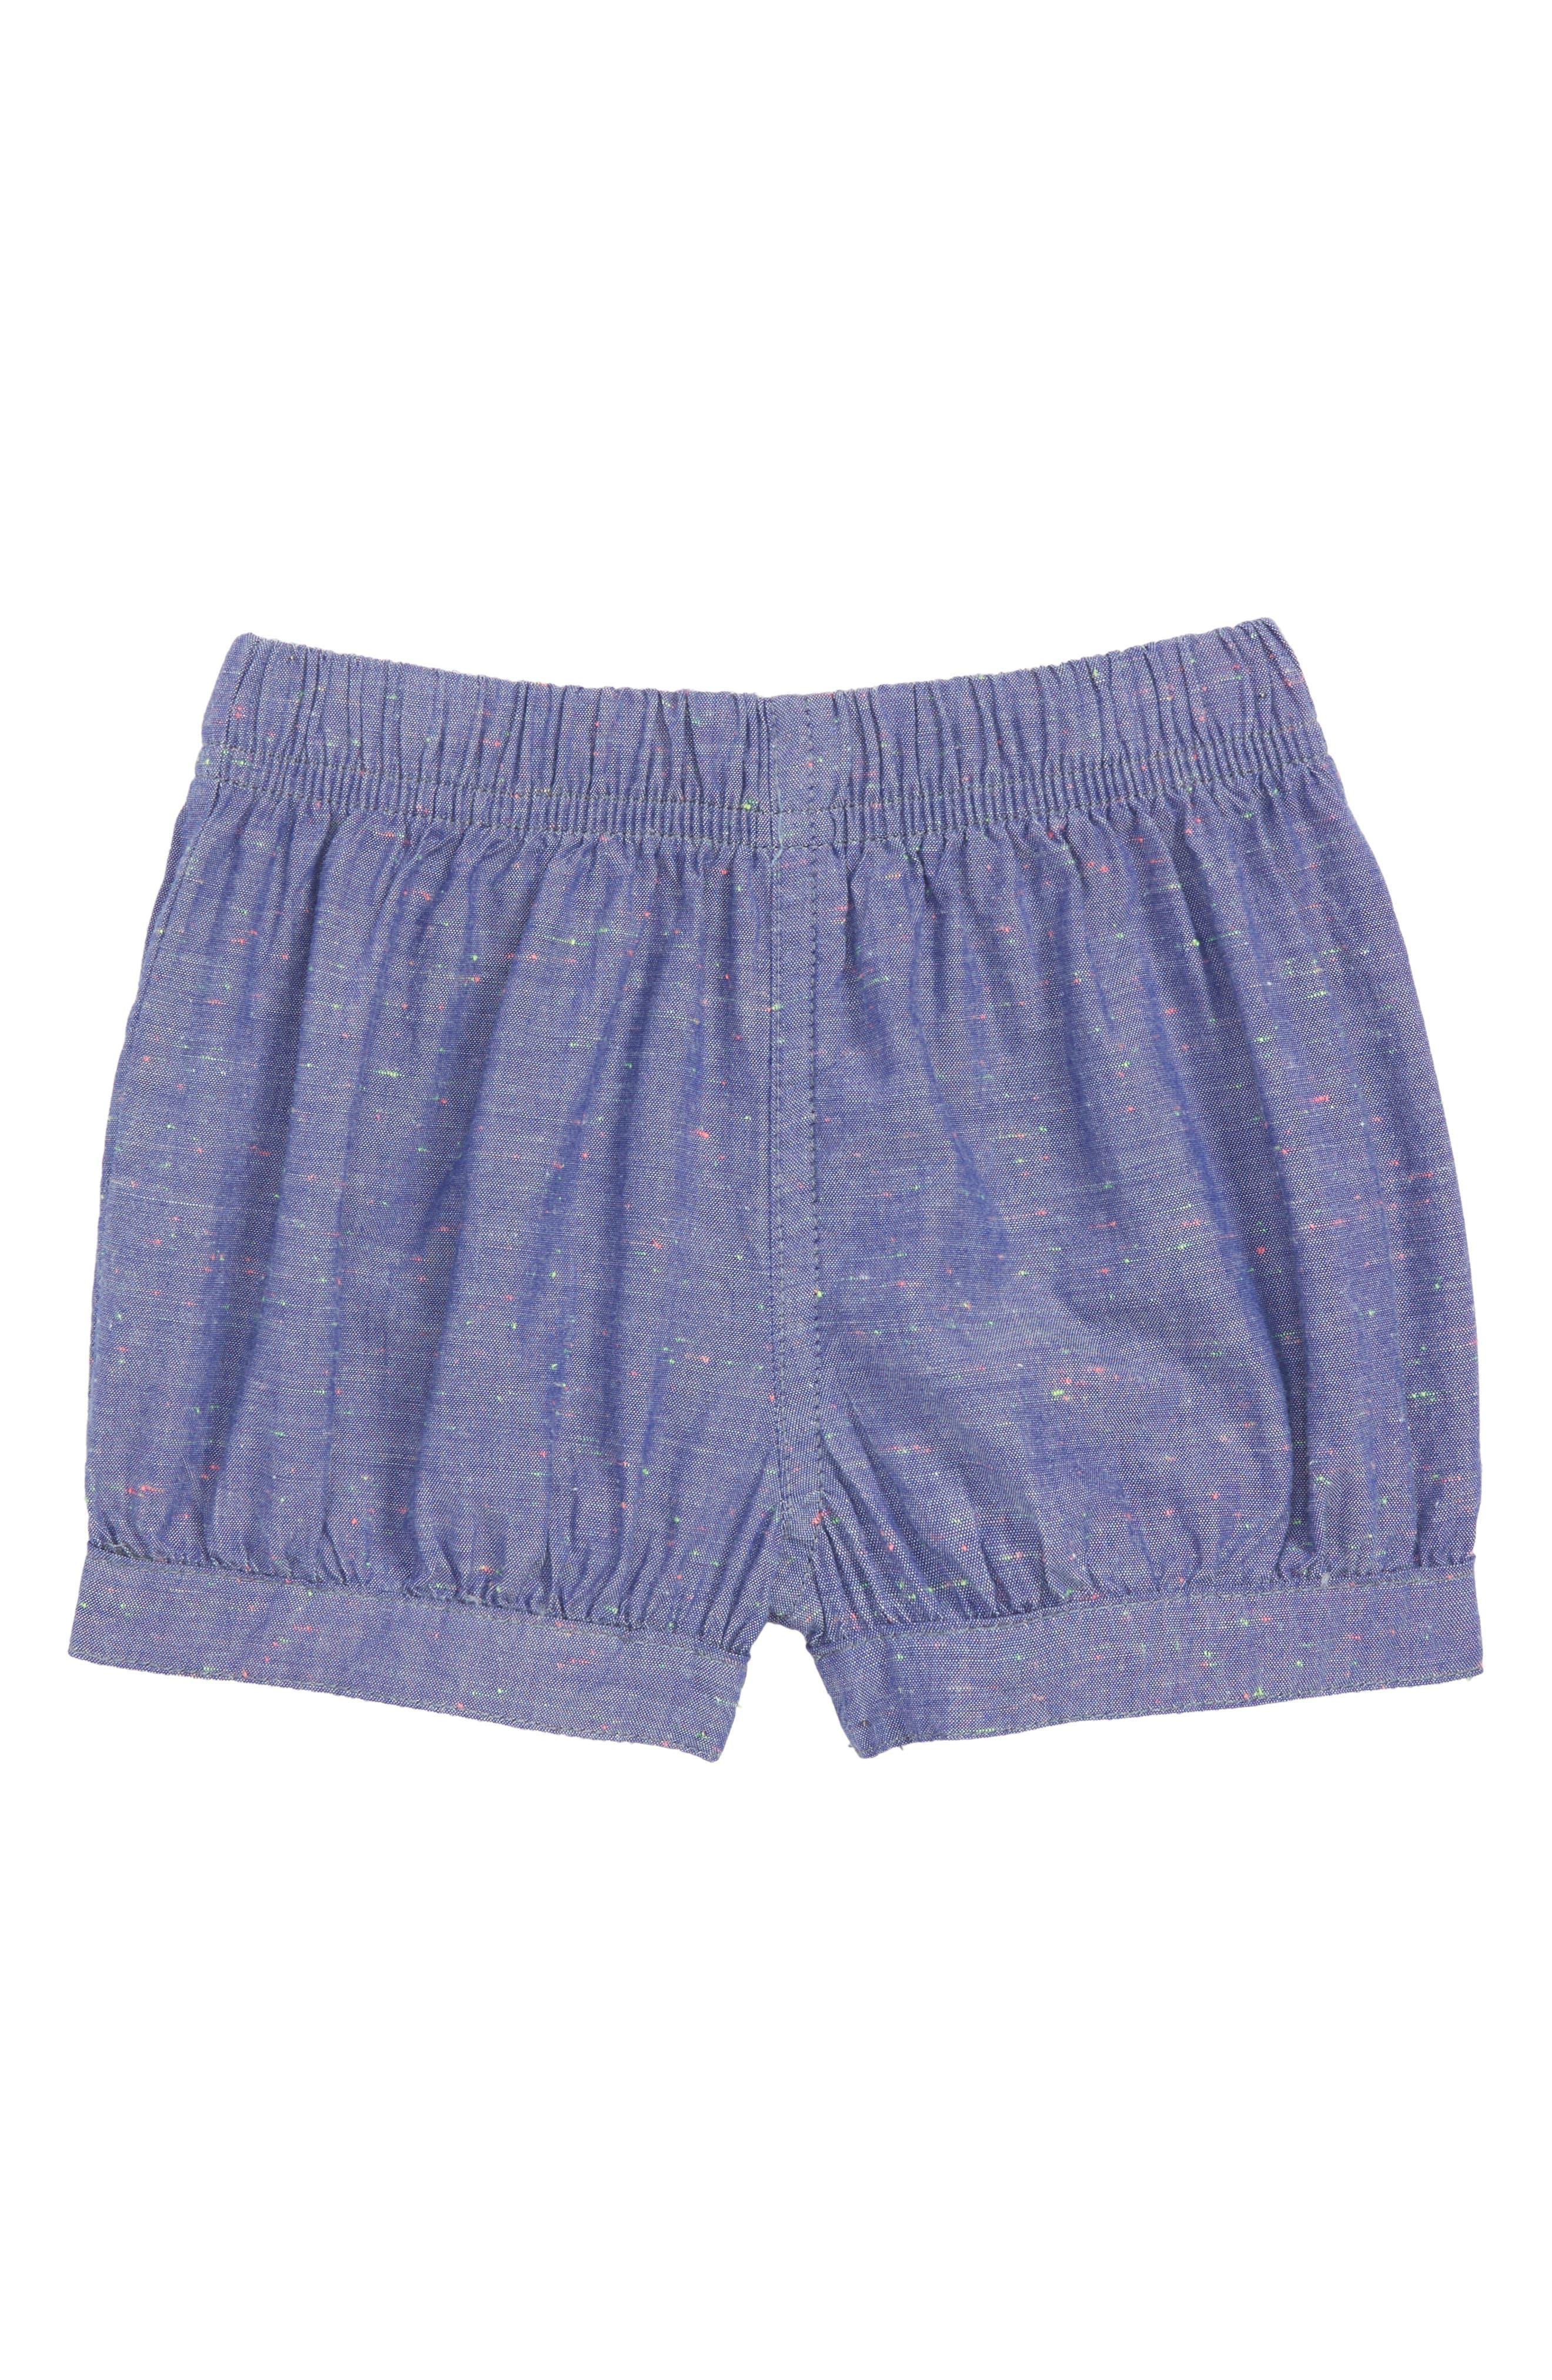 Chambray Bubble Shorts,                         Main,                         color, Indigo